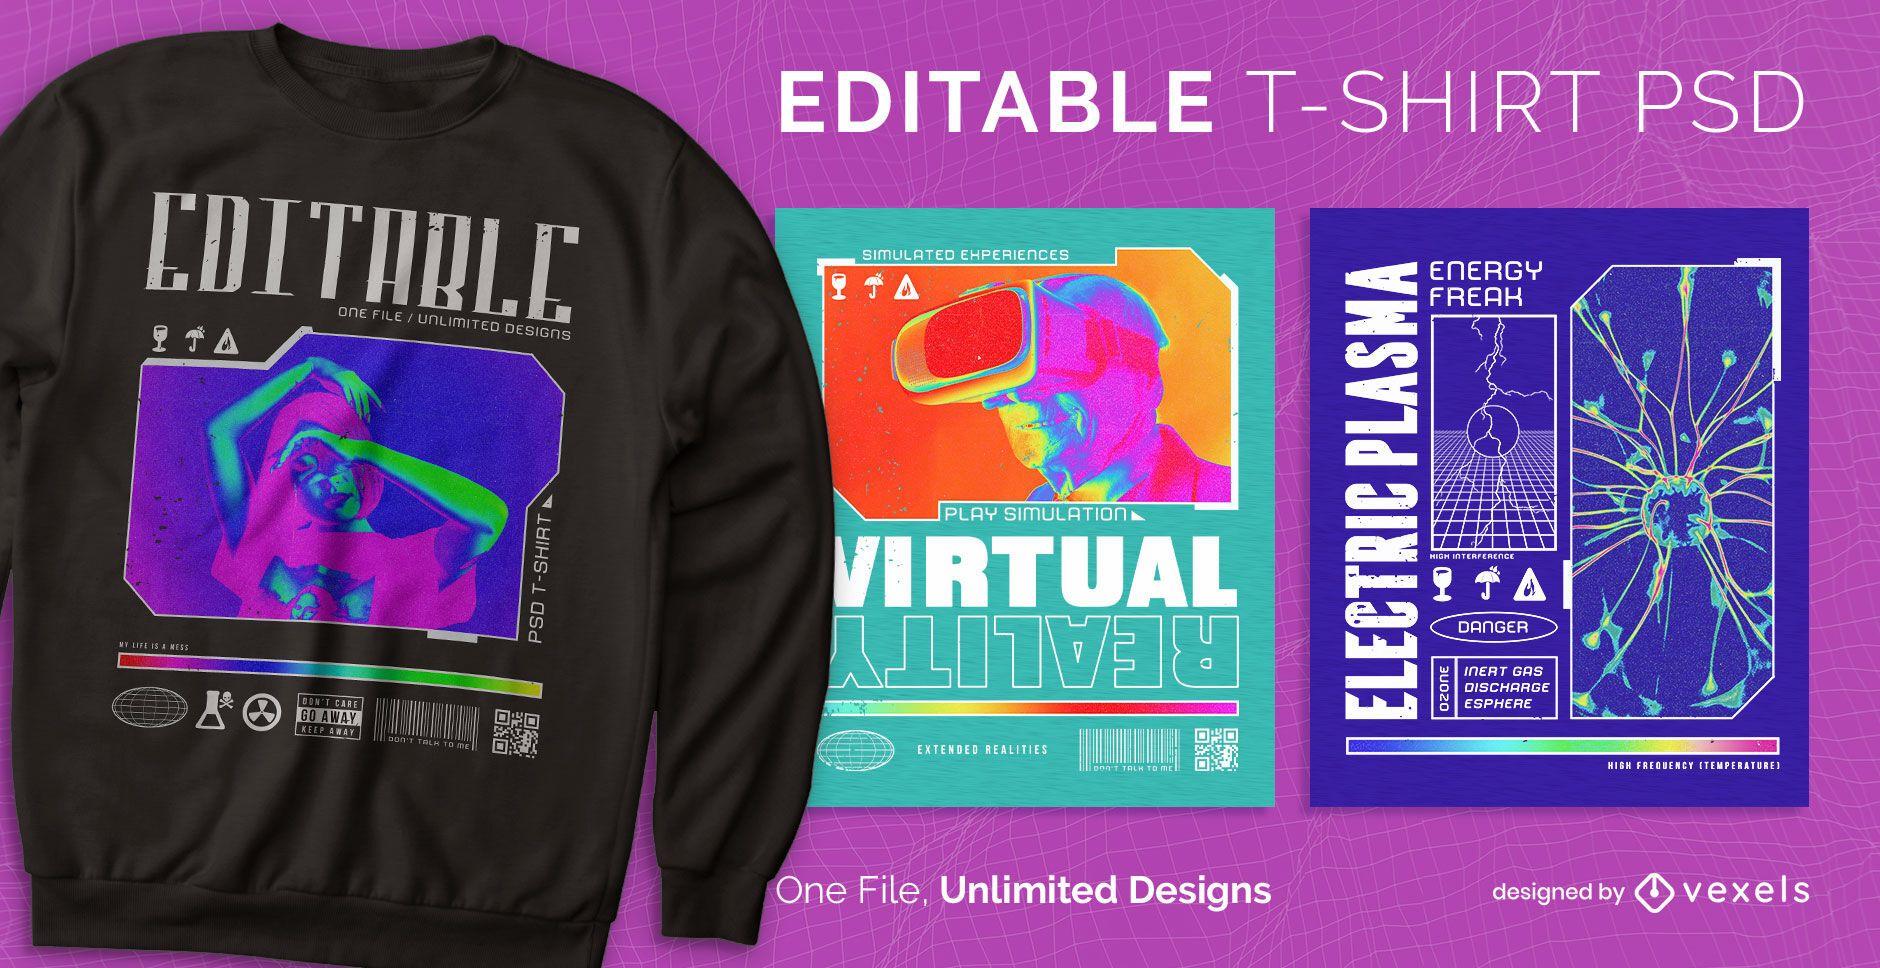 Diseño de camiseta escalable con gráficos trippy.